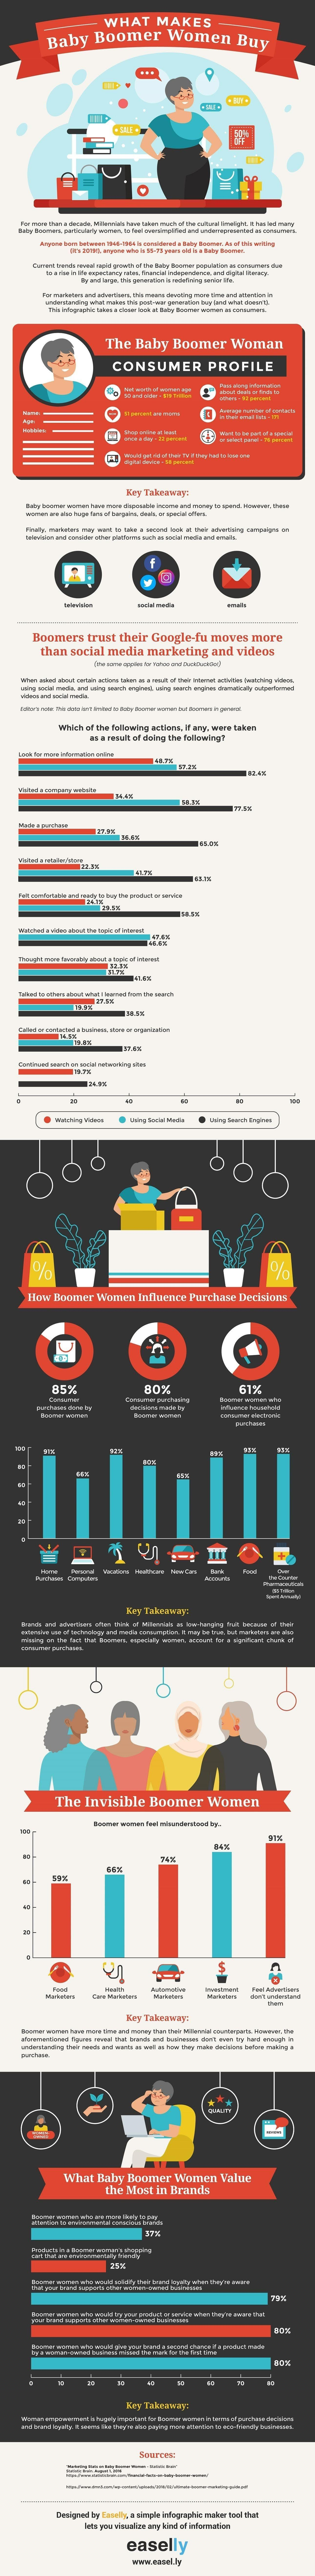 What makes women buy baby boomer  #infographic